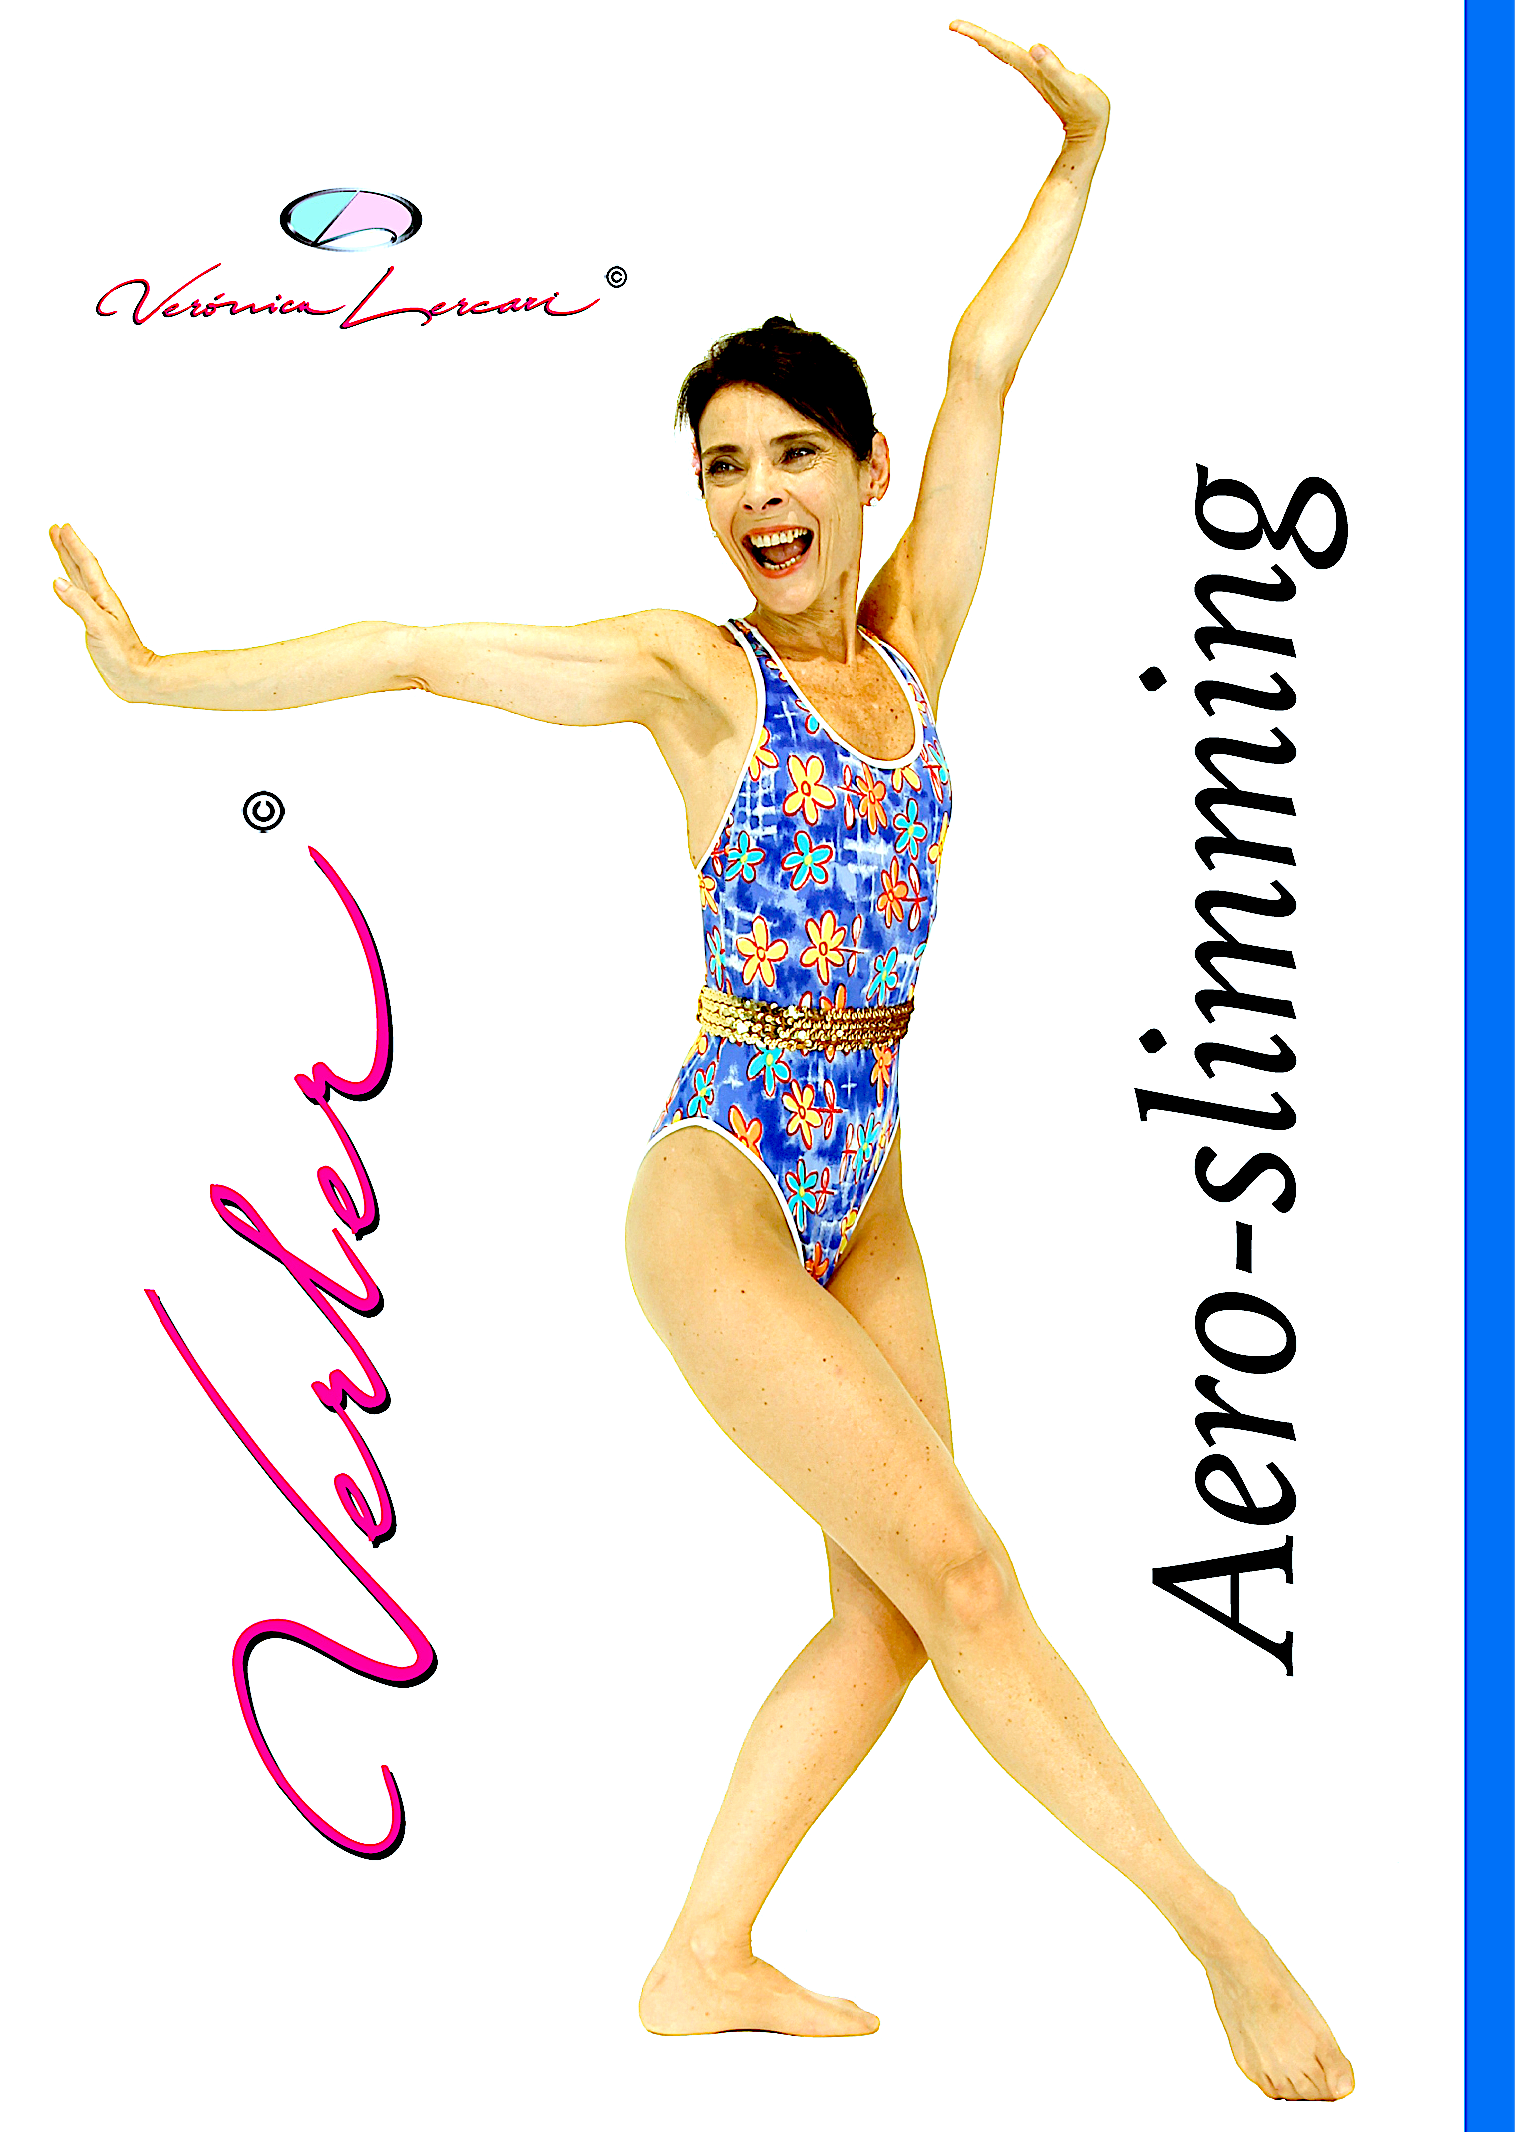 Aero-slimming